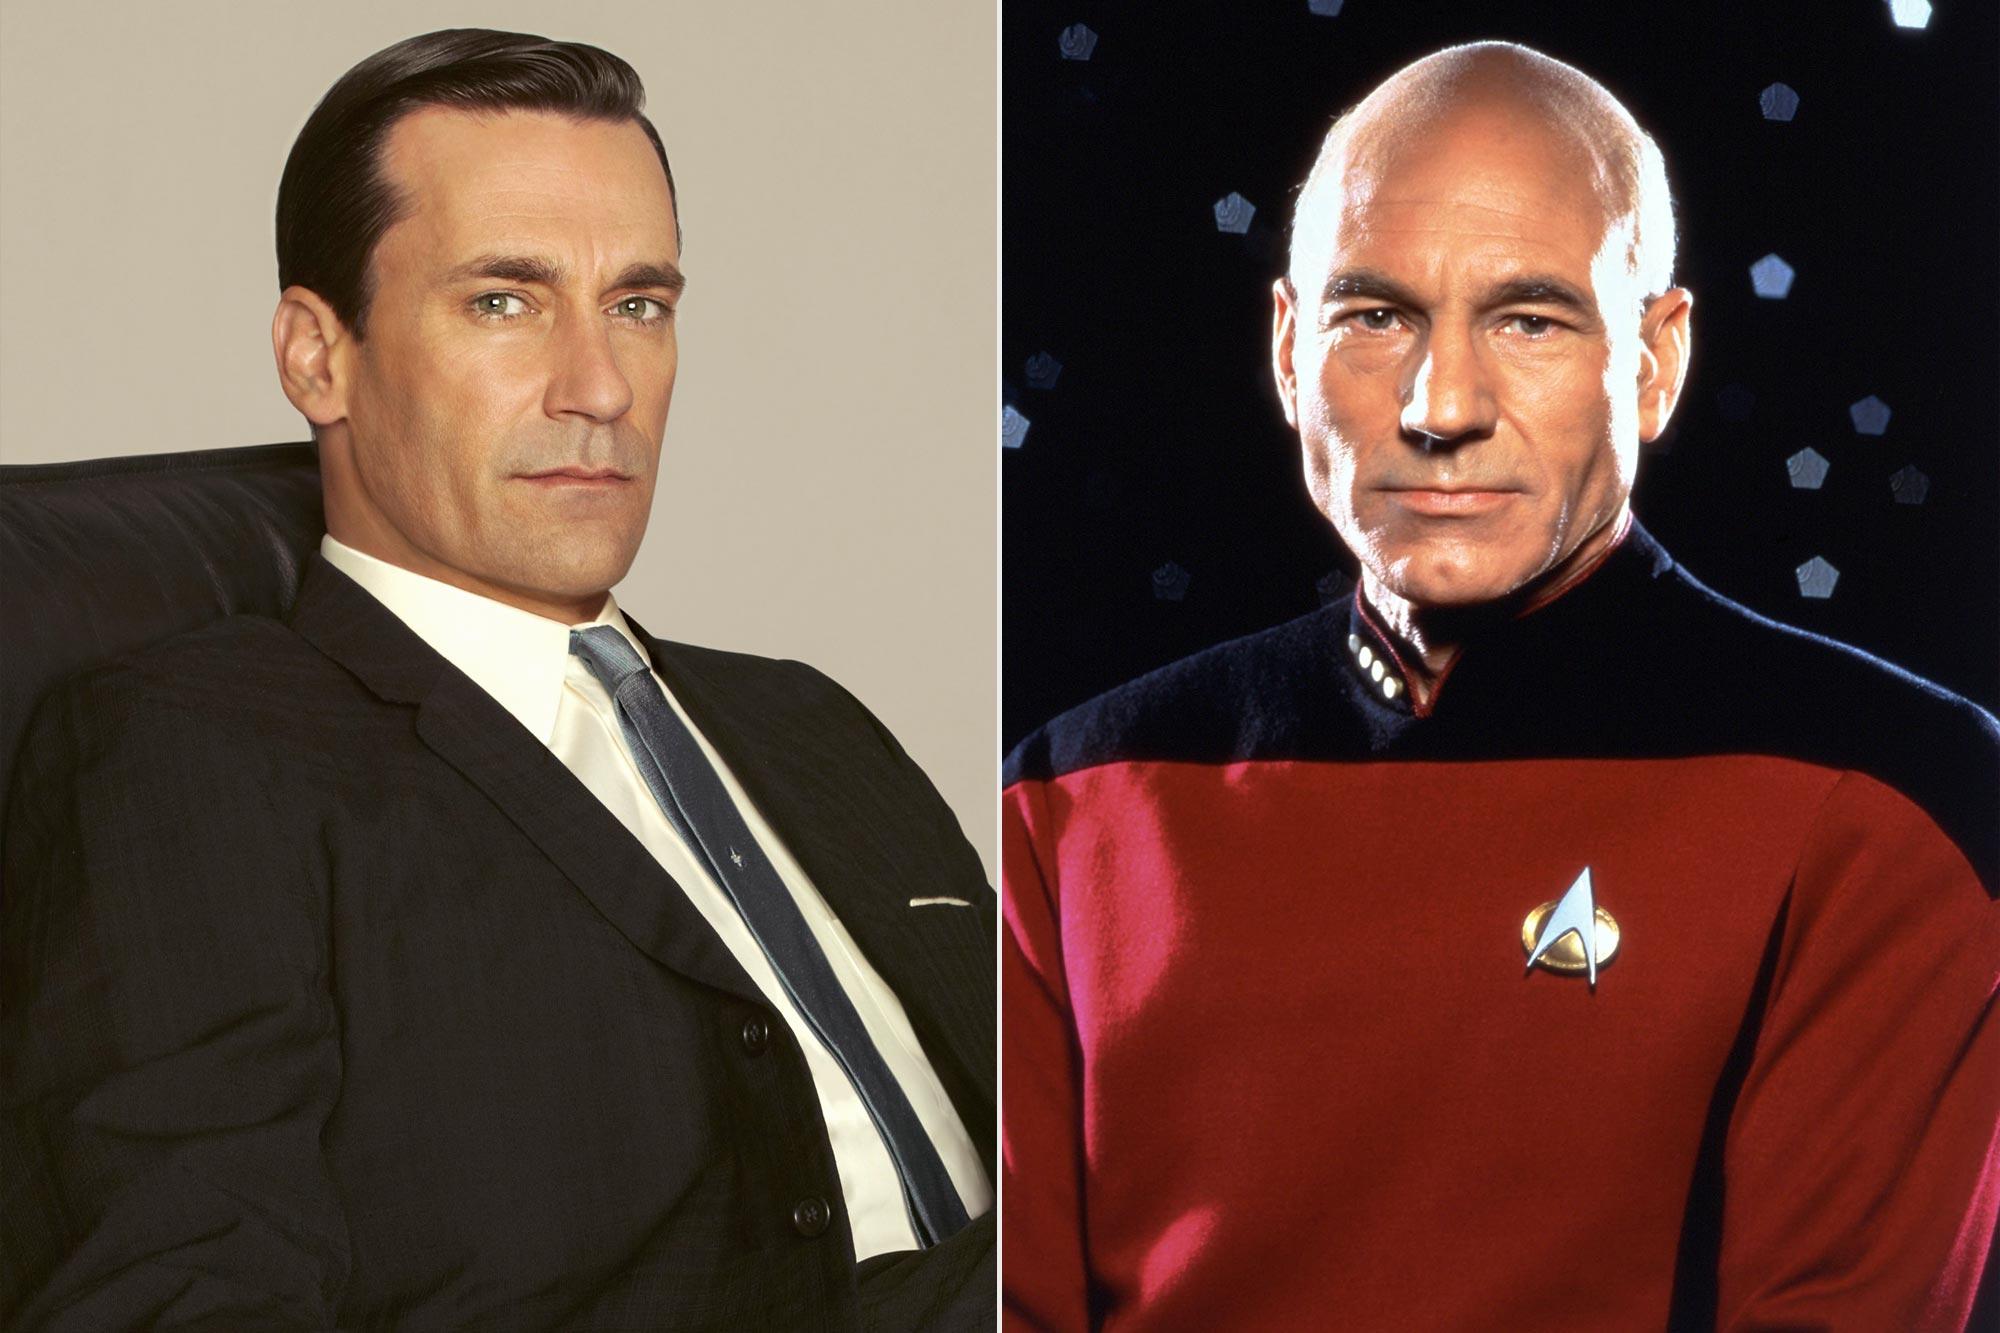 Mad Men; Star Trek: The Next Generation